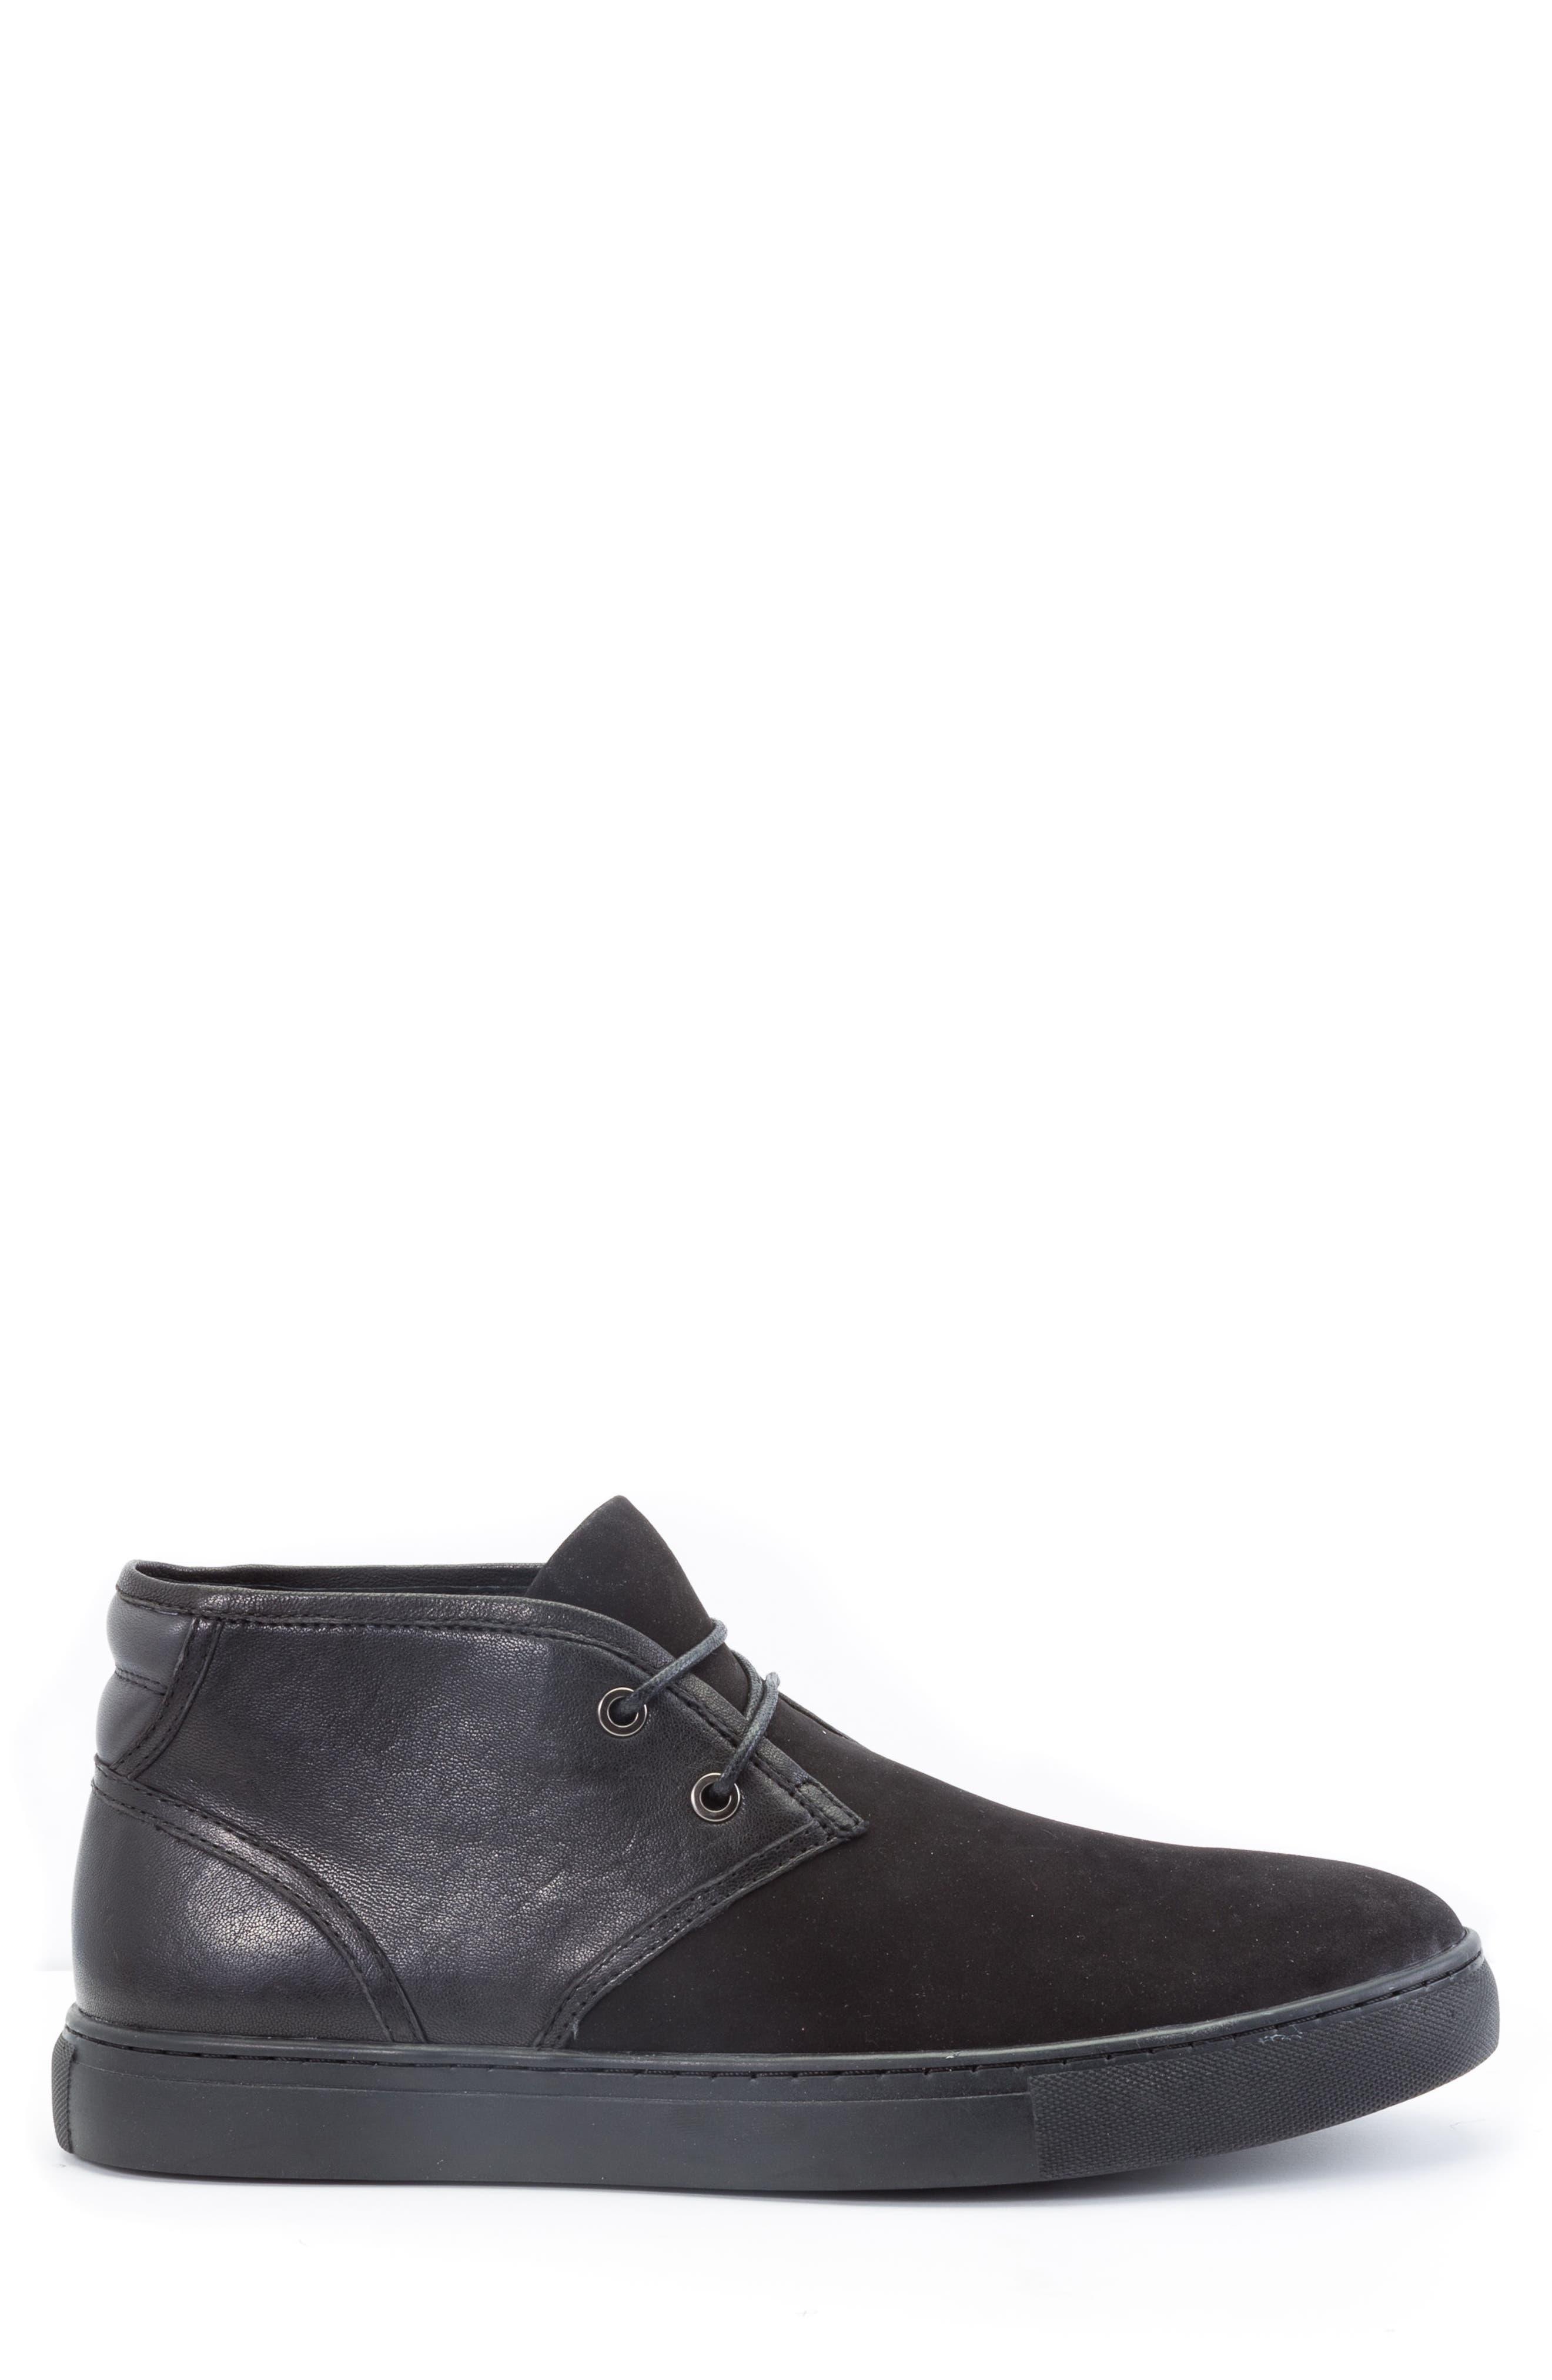 Catlett Chukka Sneaker,                             Alternate thumbnail 3, color,                             Black Suede/ Leather